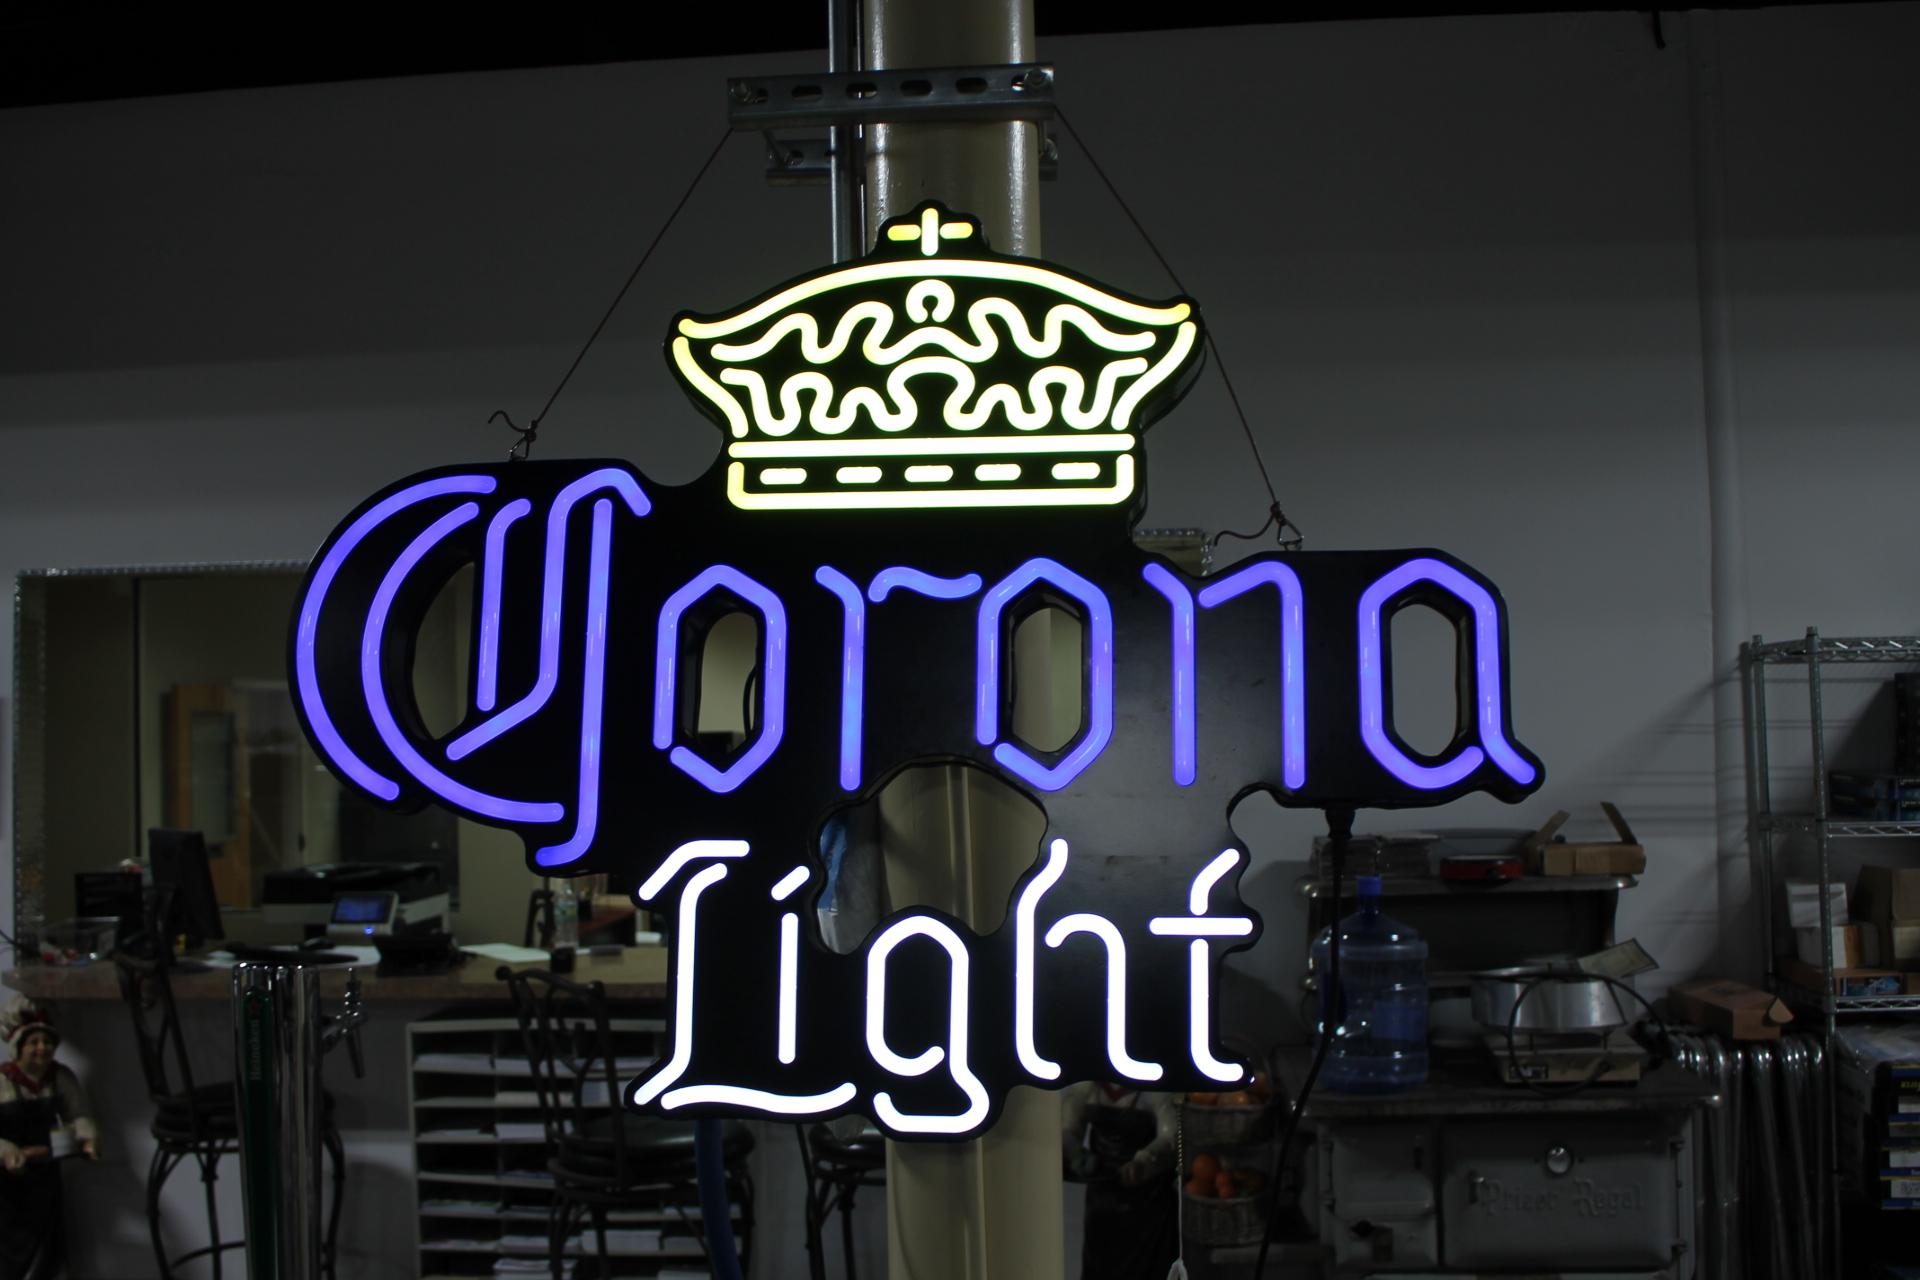 Corona Light Lrg Neon Sign